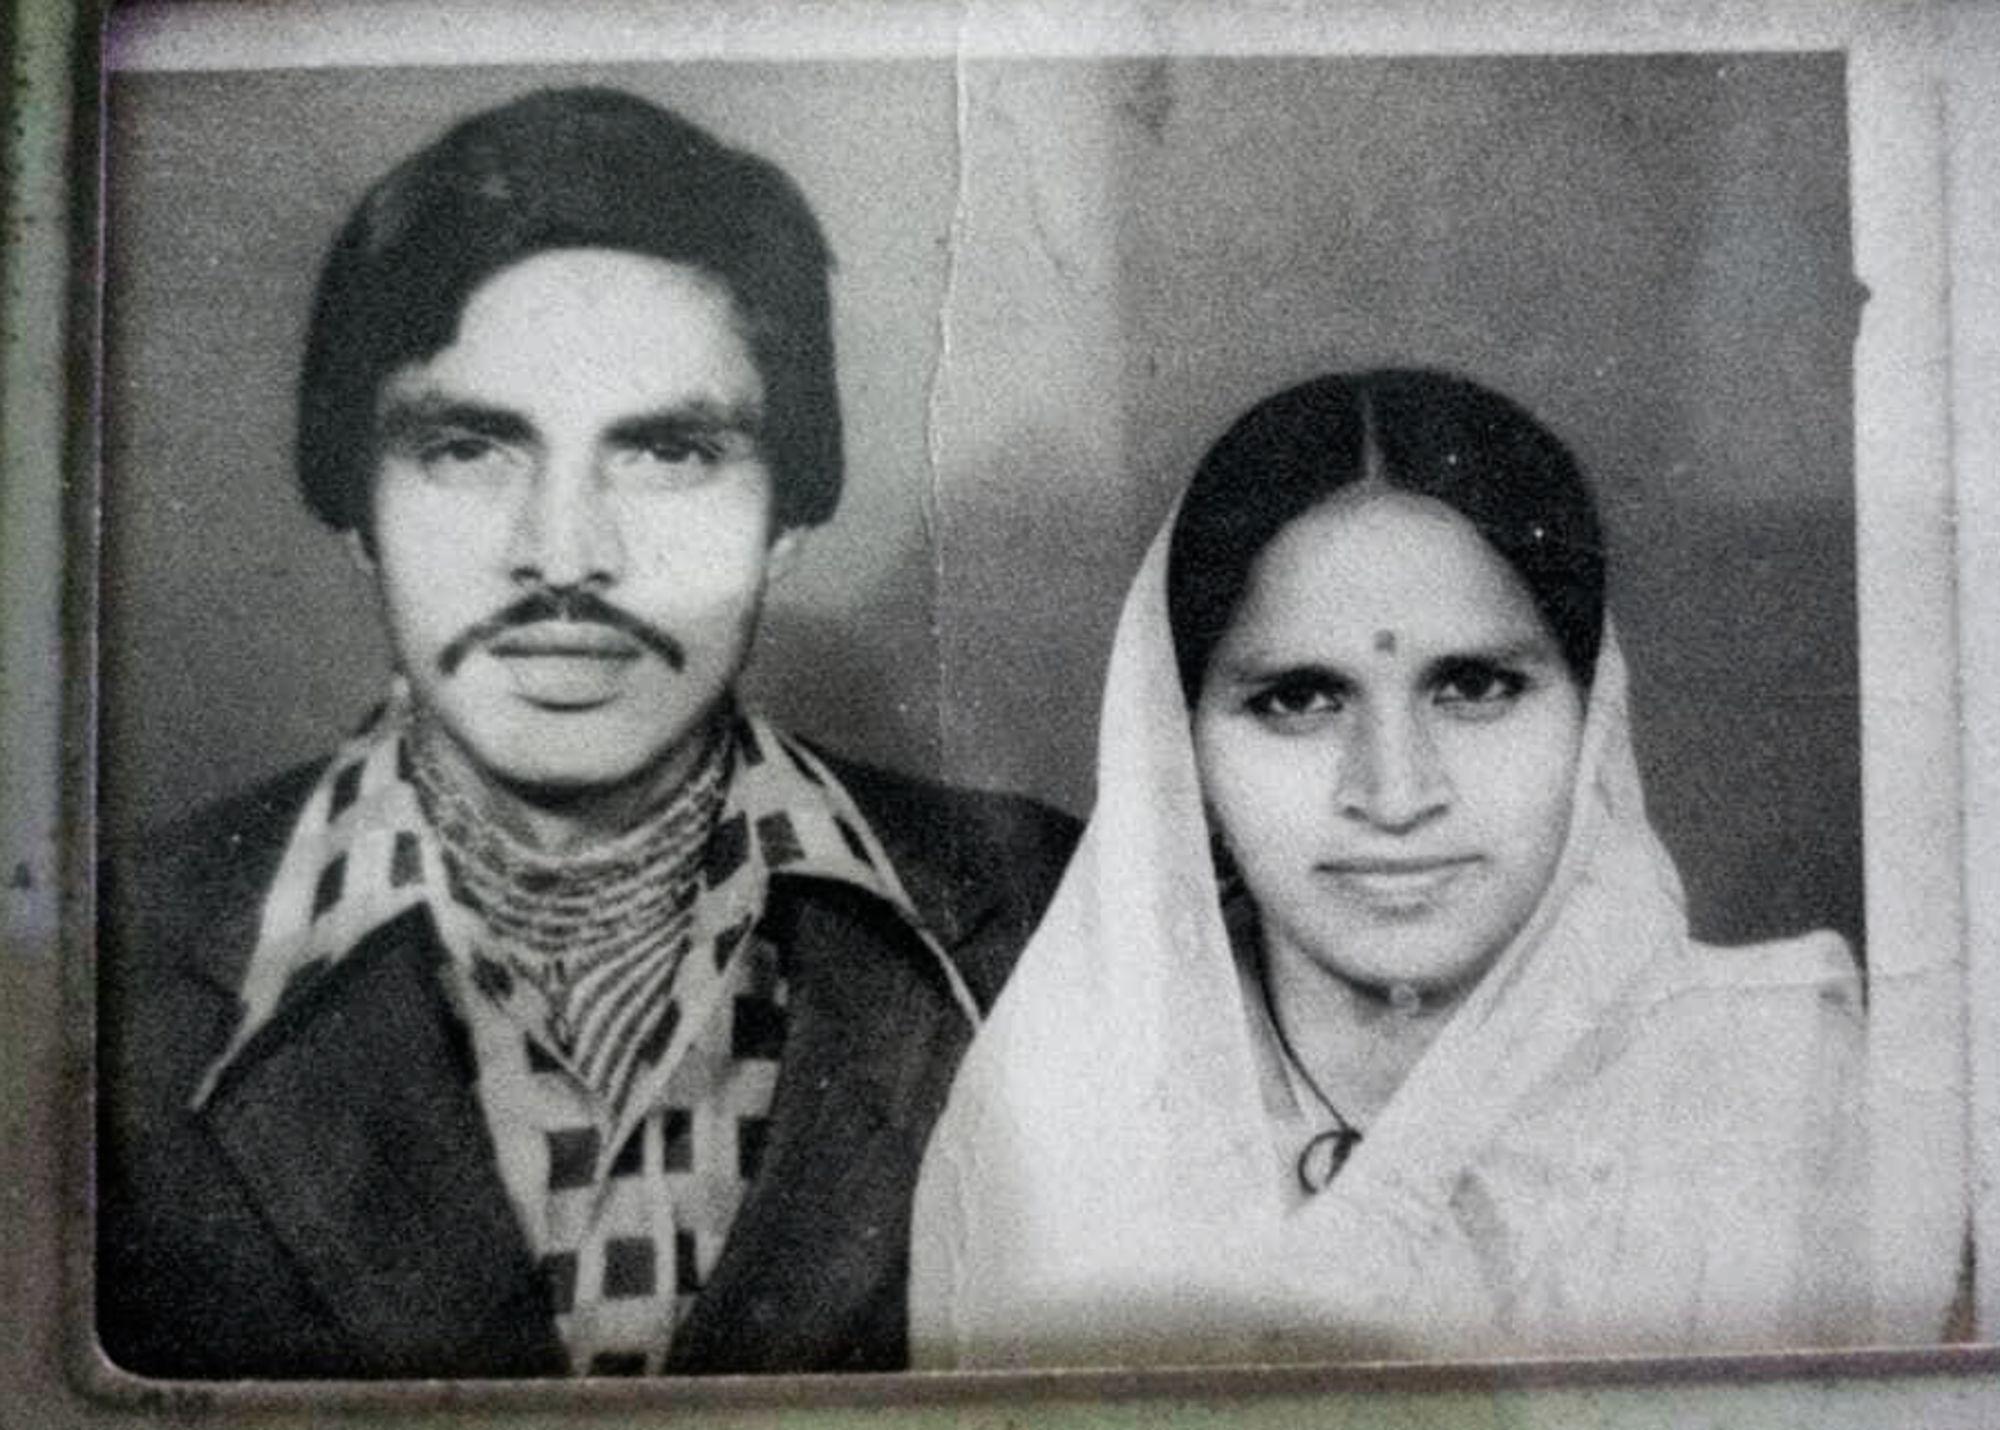 ajay parents 2 2000